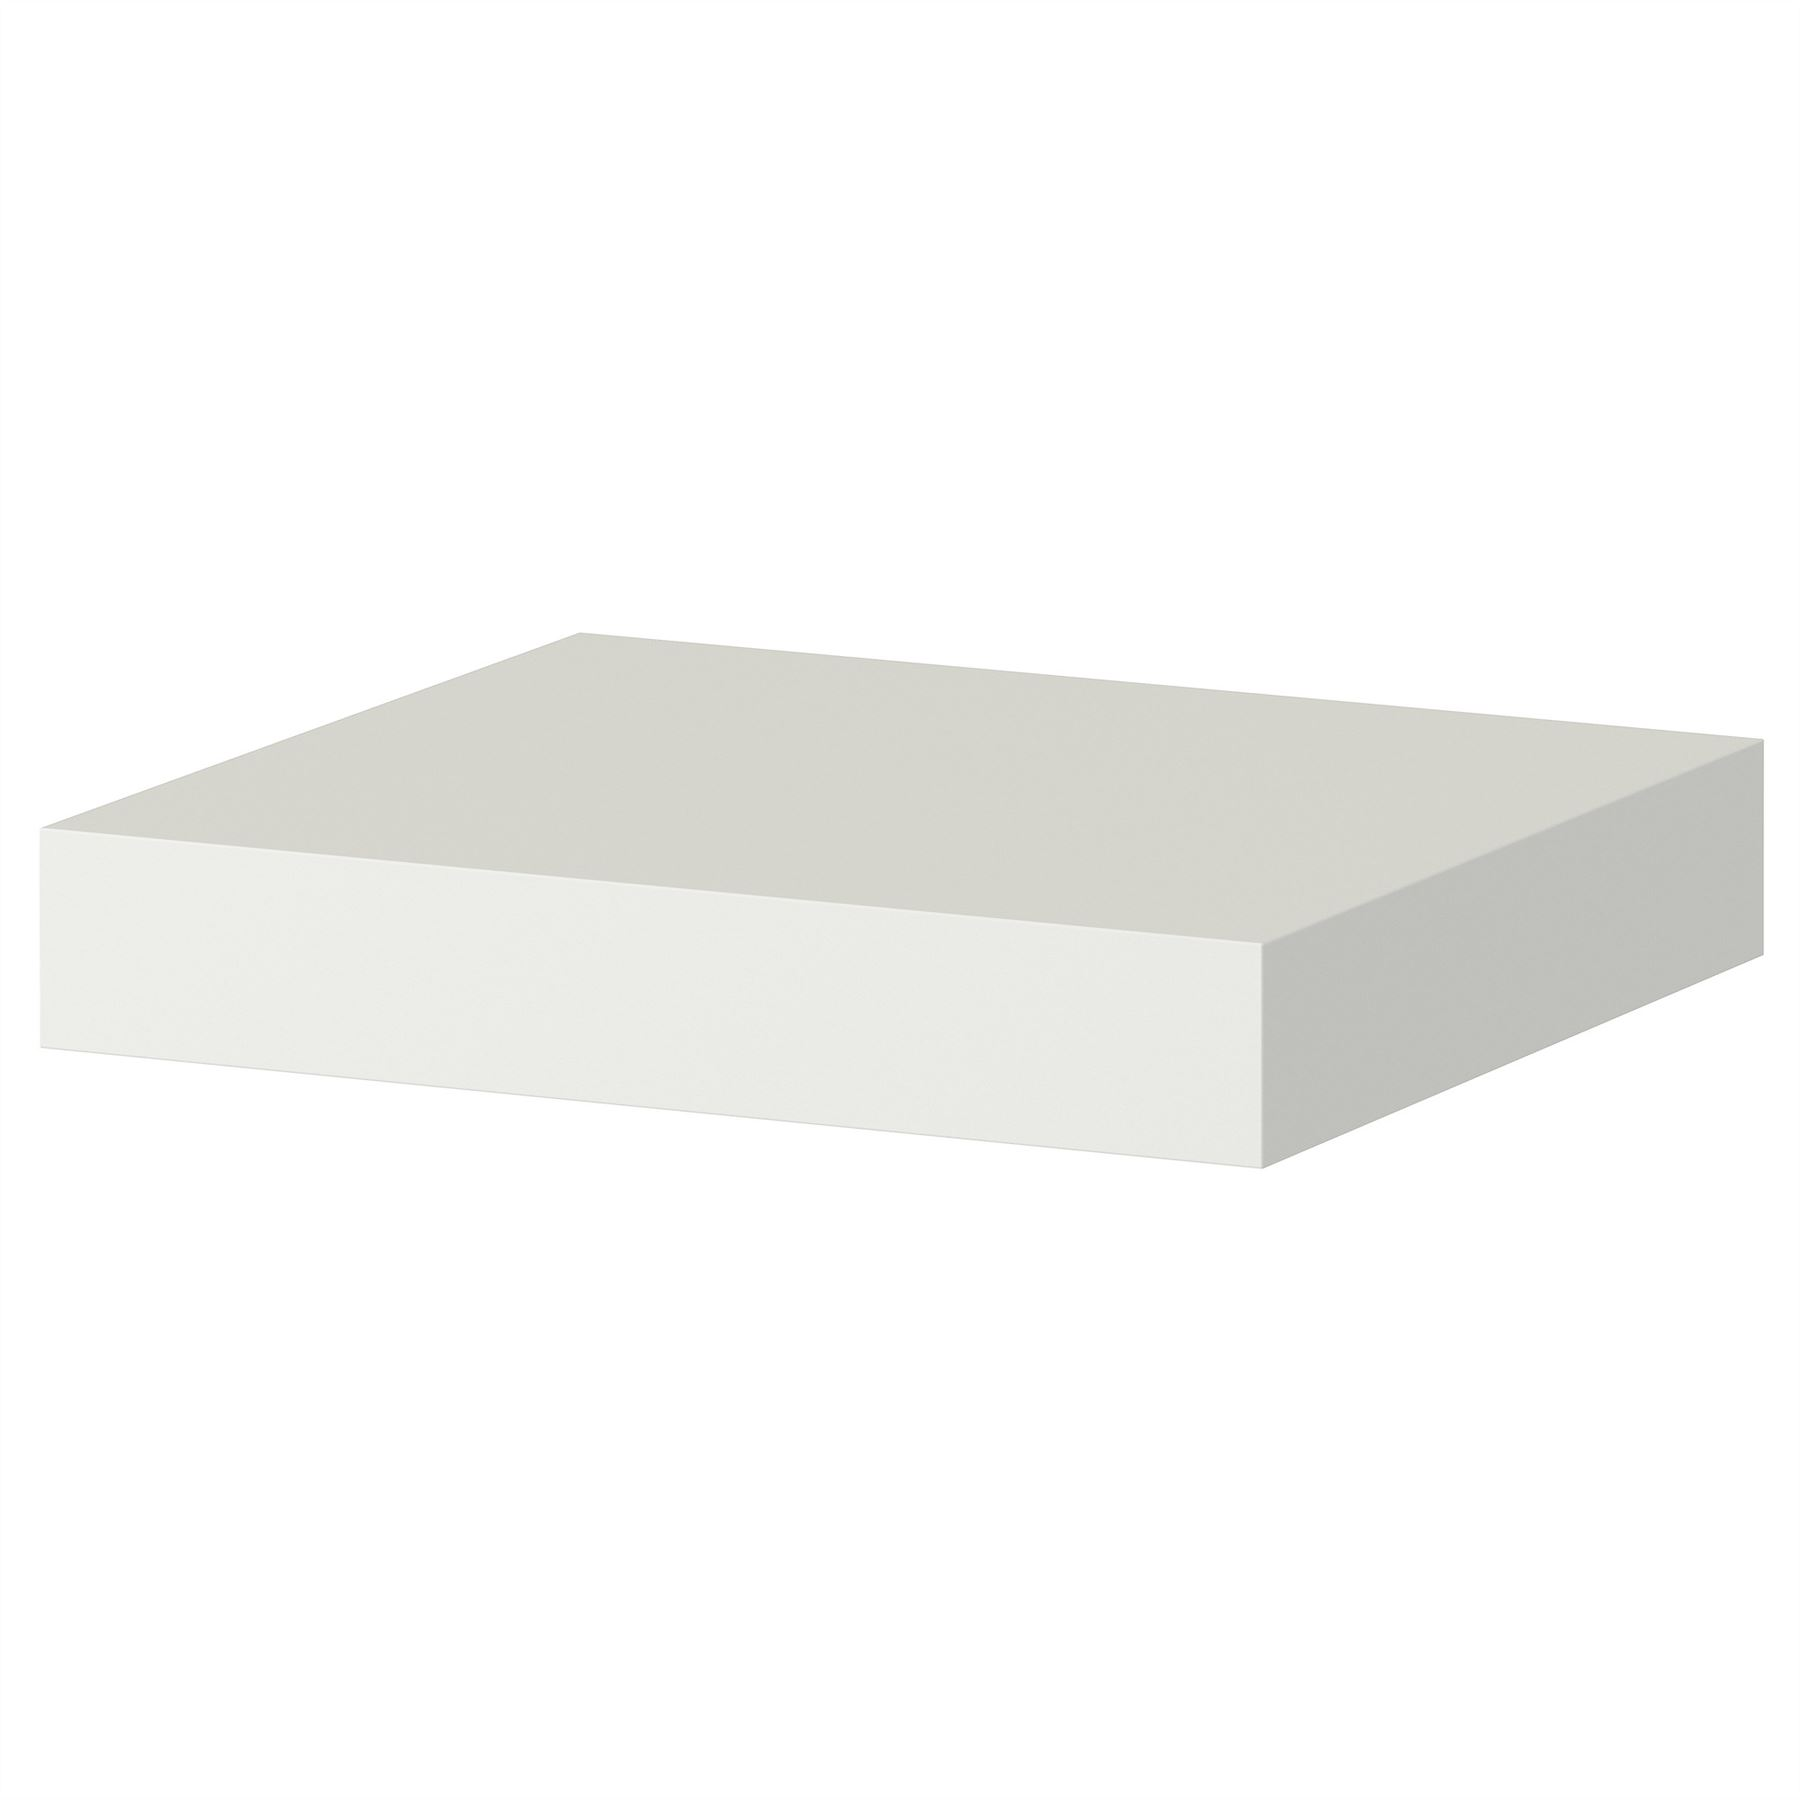 Floating Bookshelves Ikea: Ikea Lack Floating Wall Shelf Display Concealed Mounting